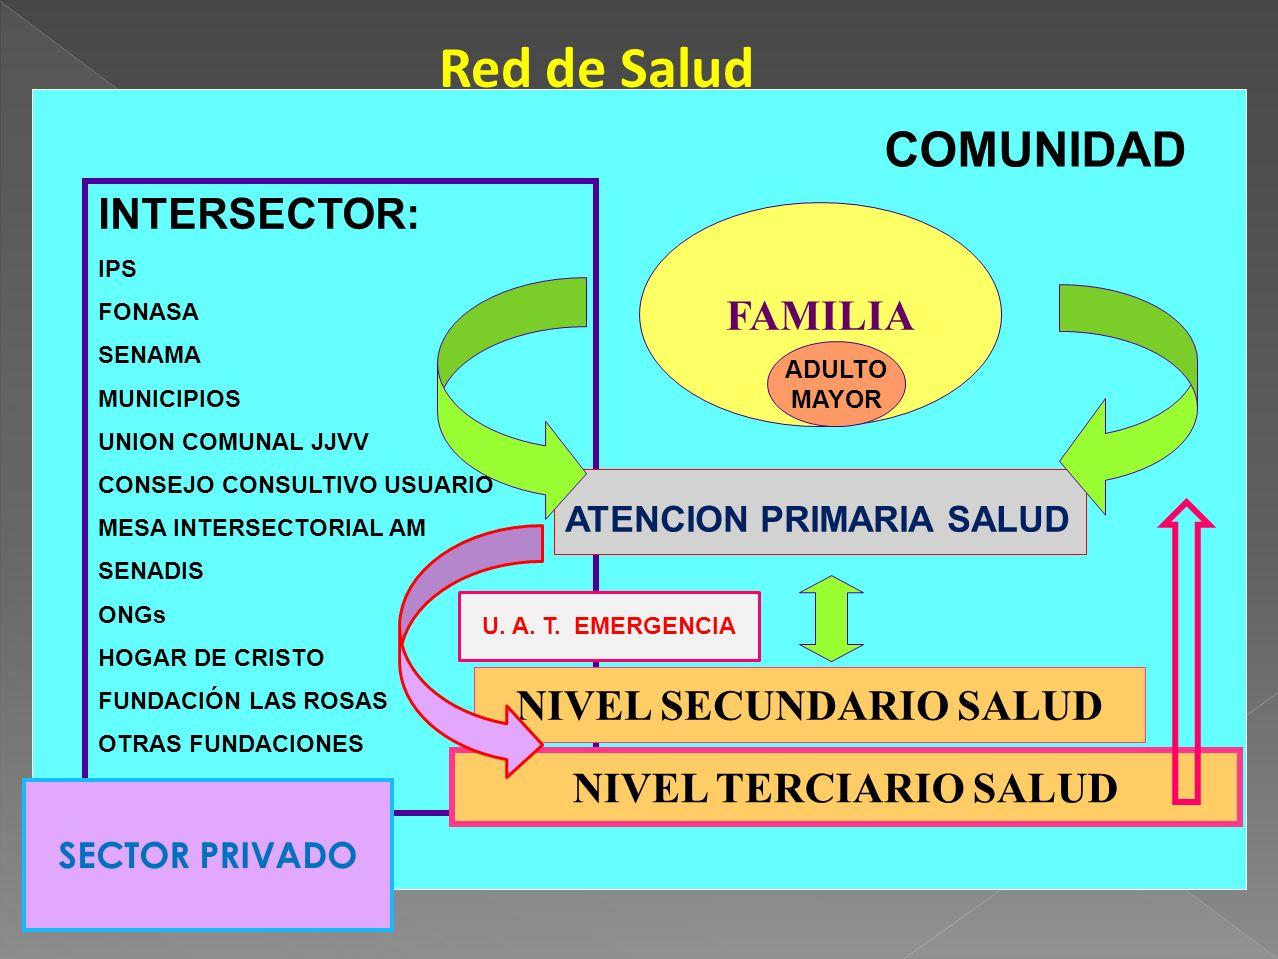 NIVEL SECUNDARIO SALUD